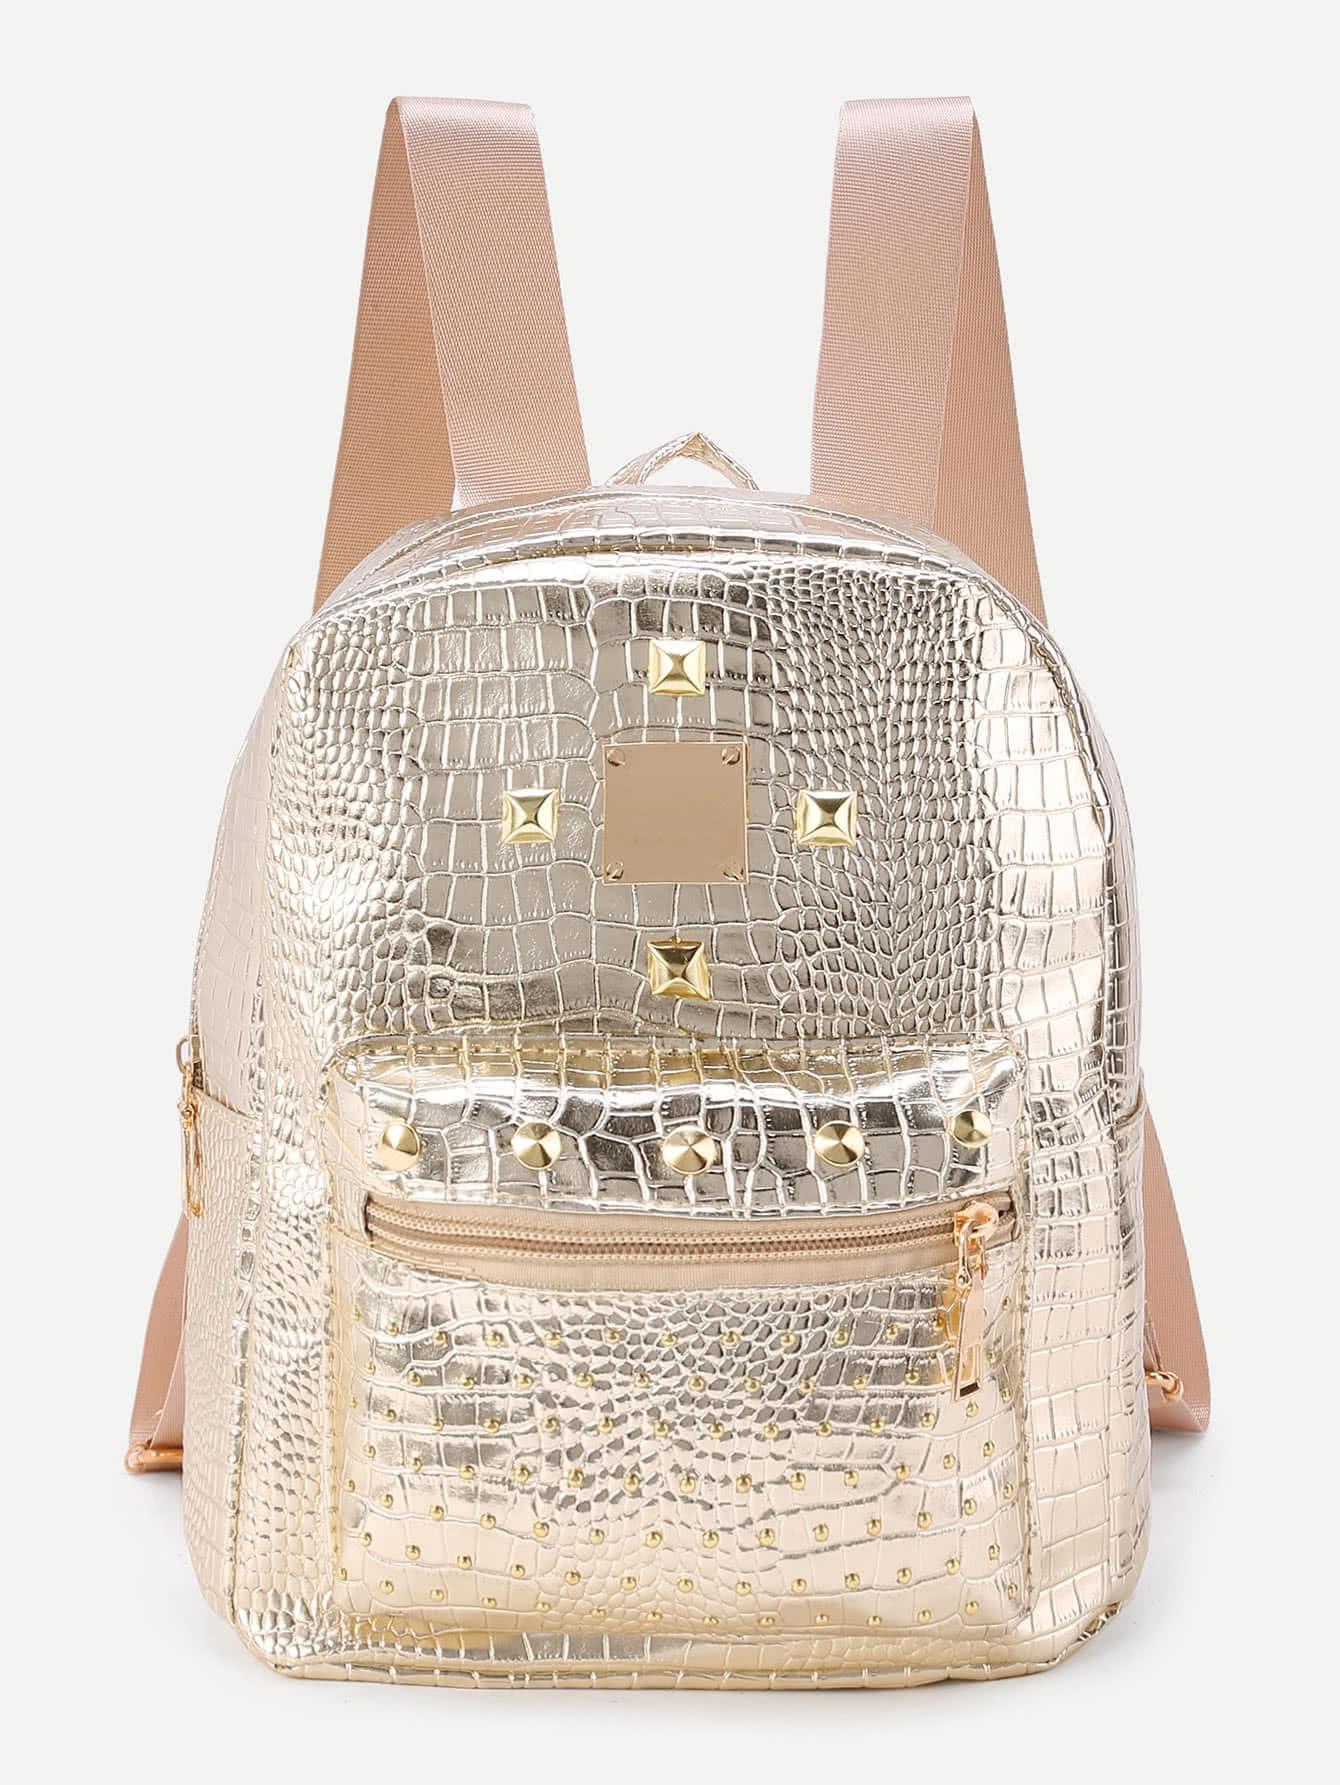 Studded Detail Crocodile Backpack metallic crocodile textured backpack